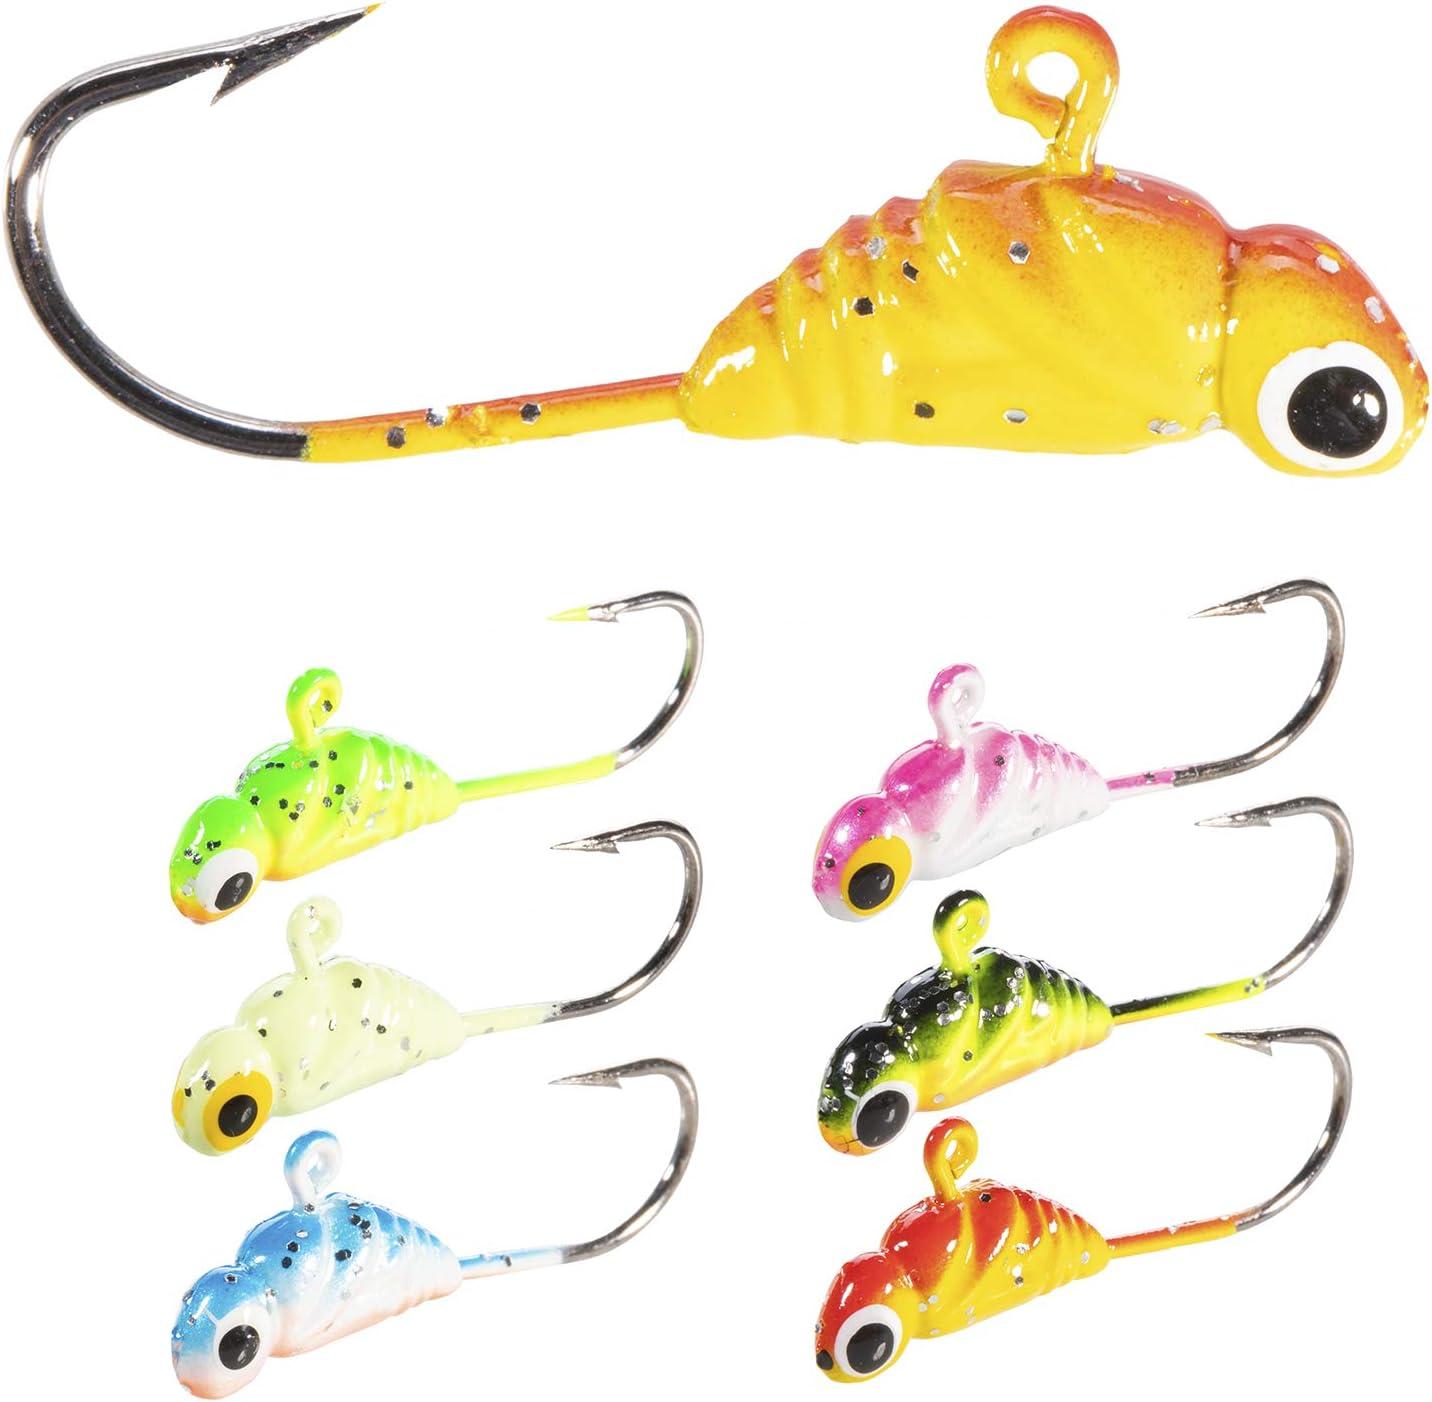 No//Brand Atreelure Ice Fishing Lures Glow Tackle Fishing Lead jig Heads Fishing Bait Hook Treble Hooks Winter Metal